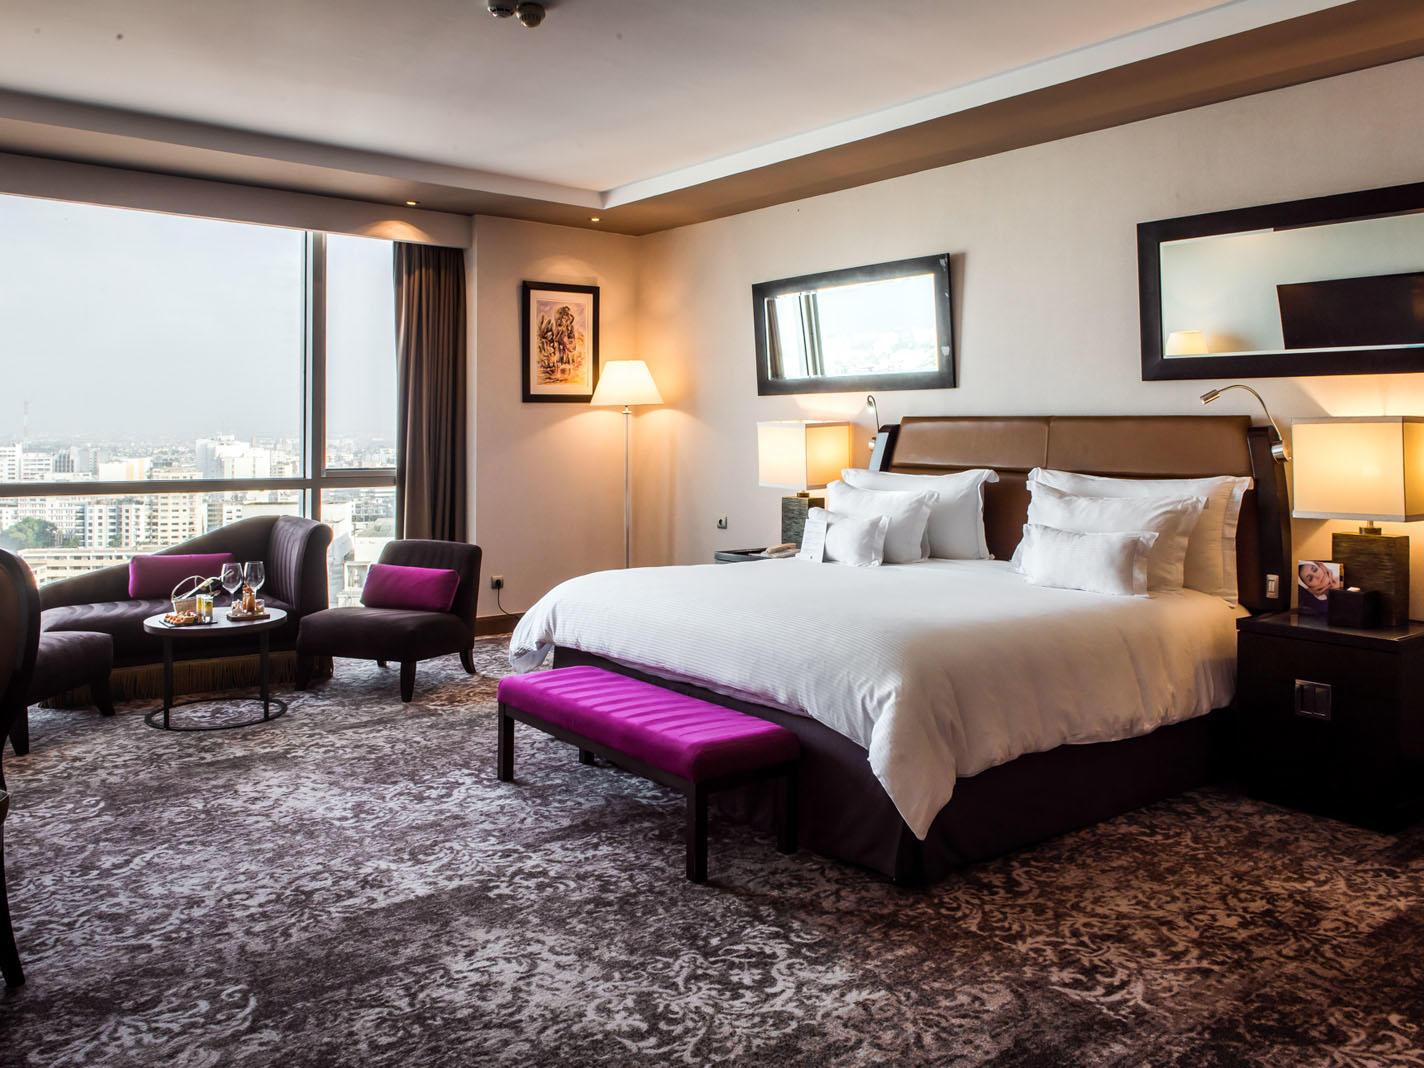 Premium Sky Room at Kenzi Tower Hotel in Casablanca, Morocco